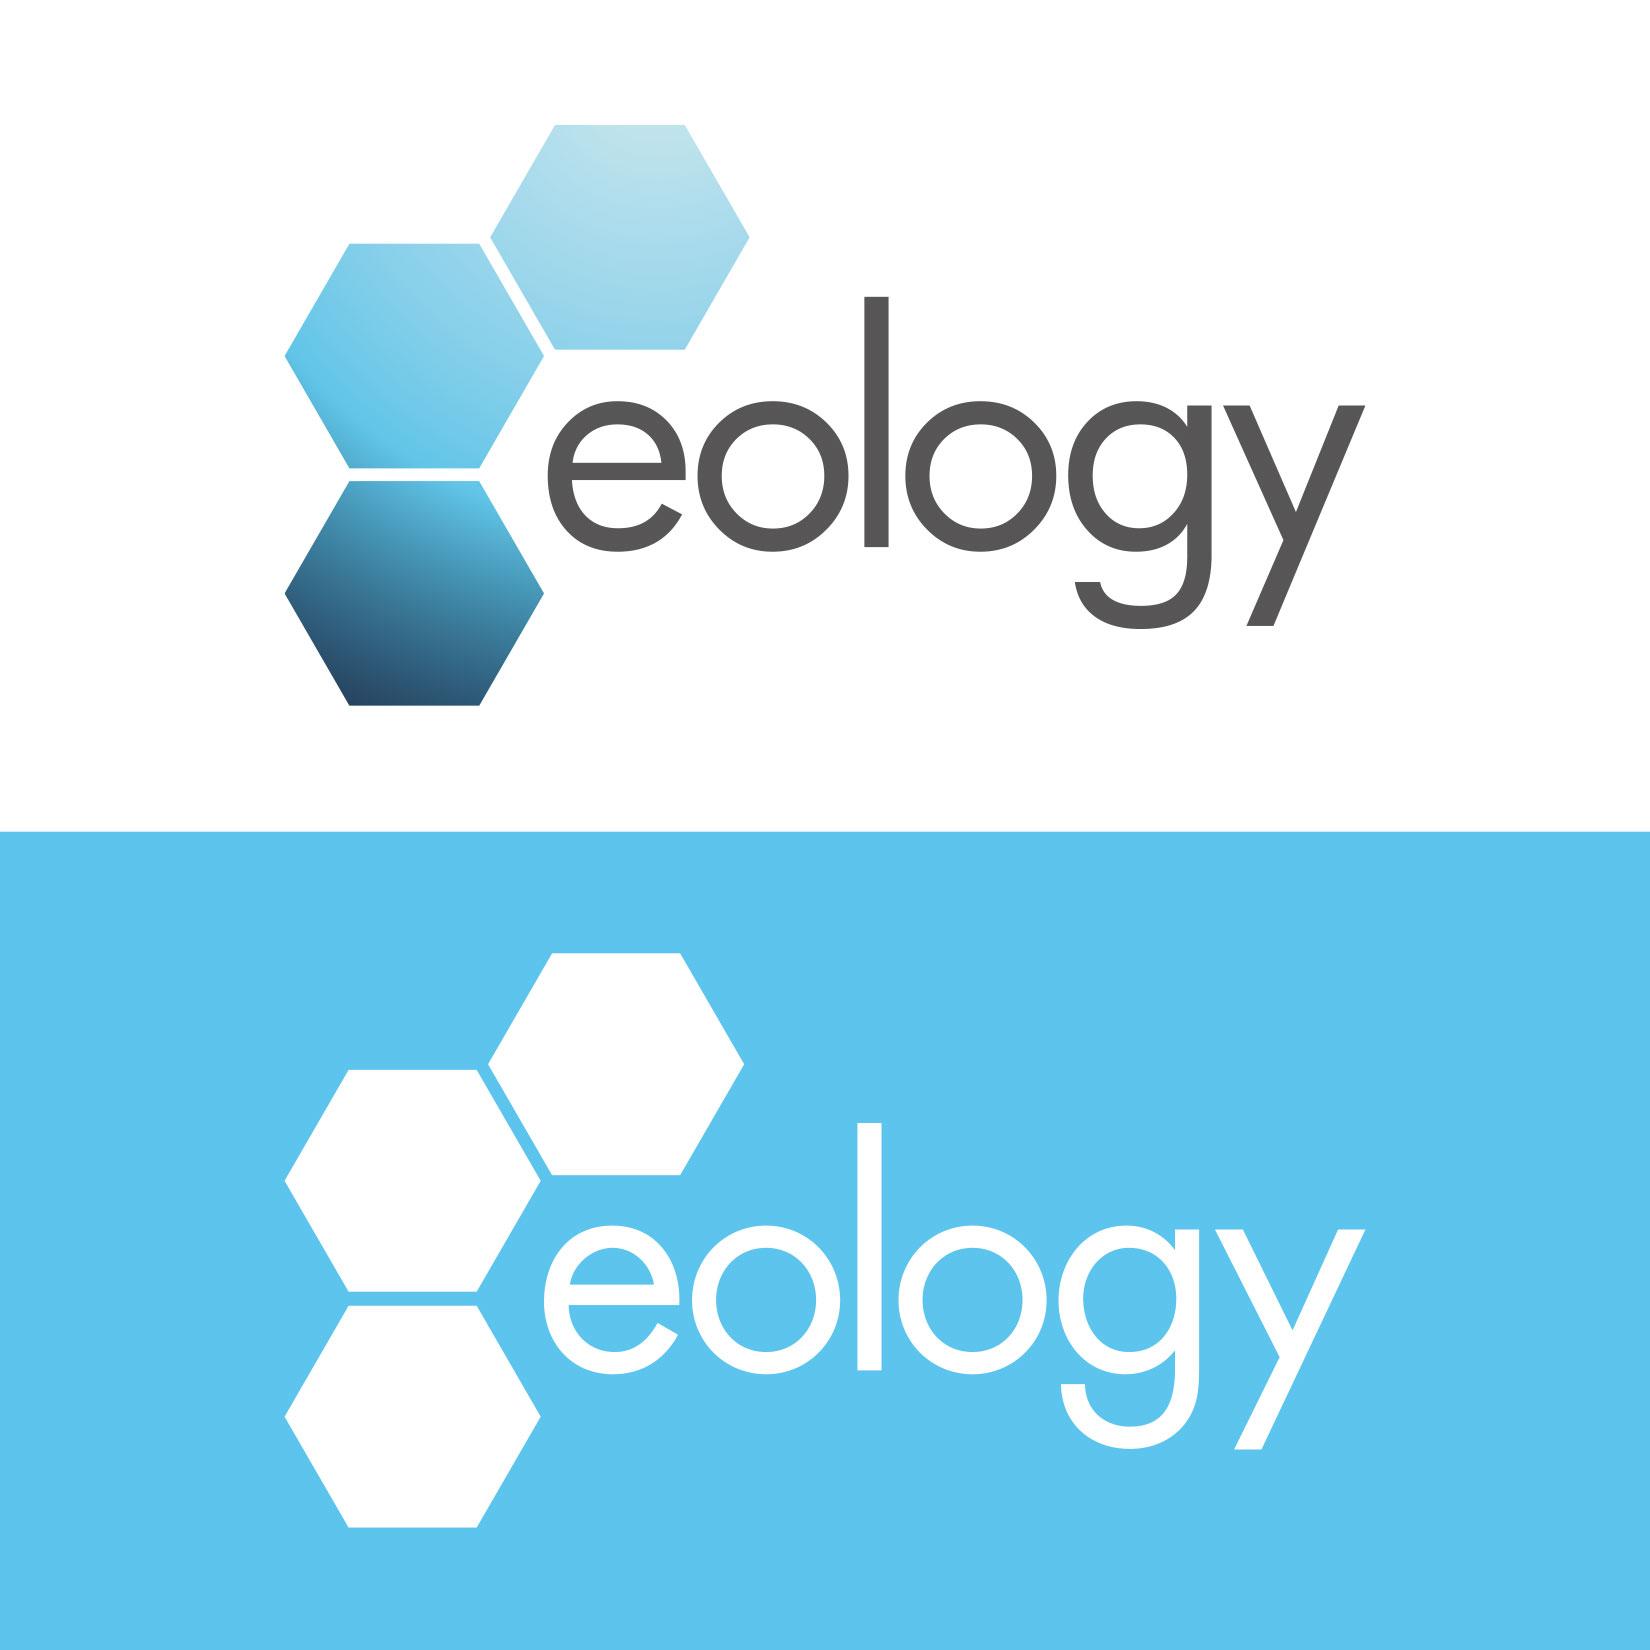 Eology Corporate Design Logoevolution